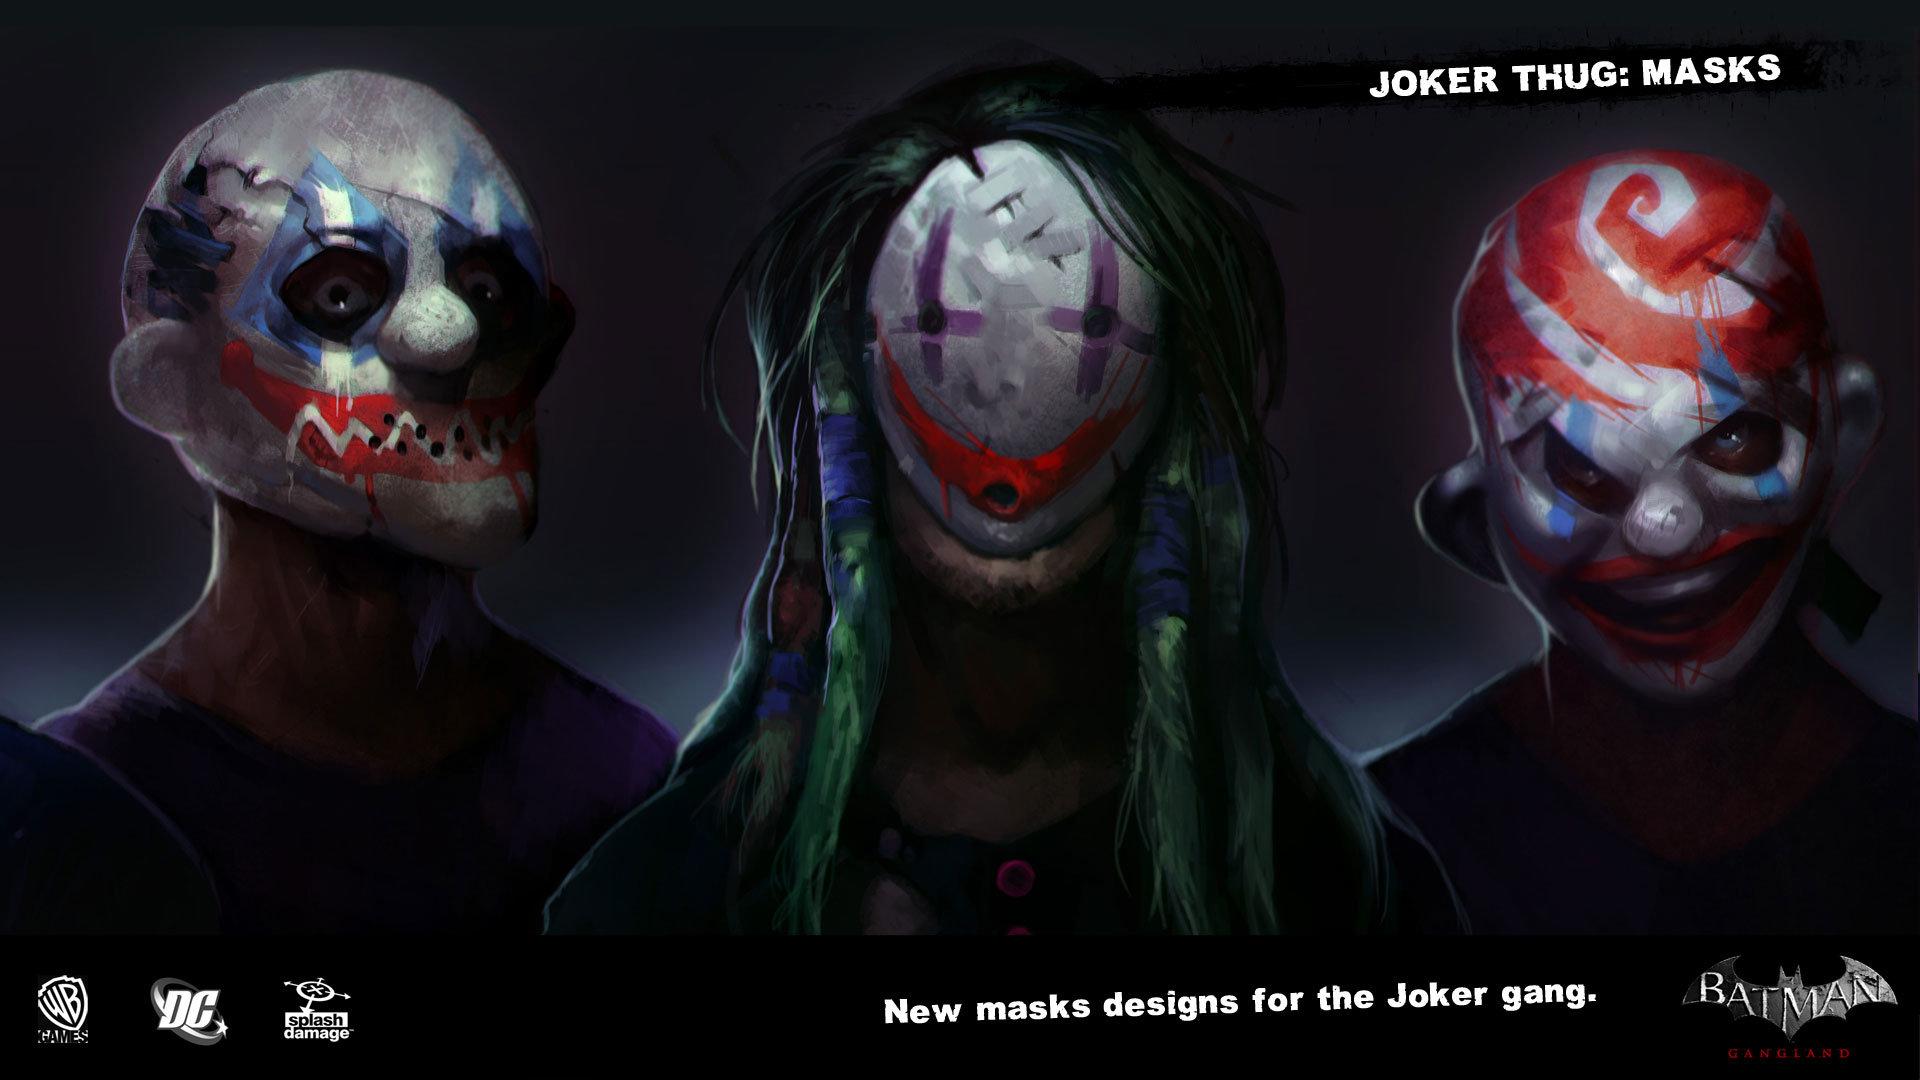 Manuel augusto dischinger moura splashdamage joker thug outfit masks1